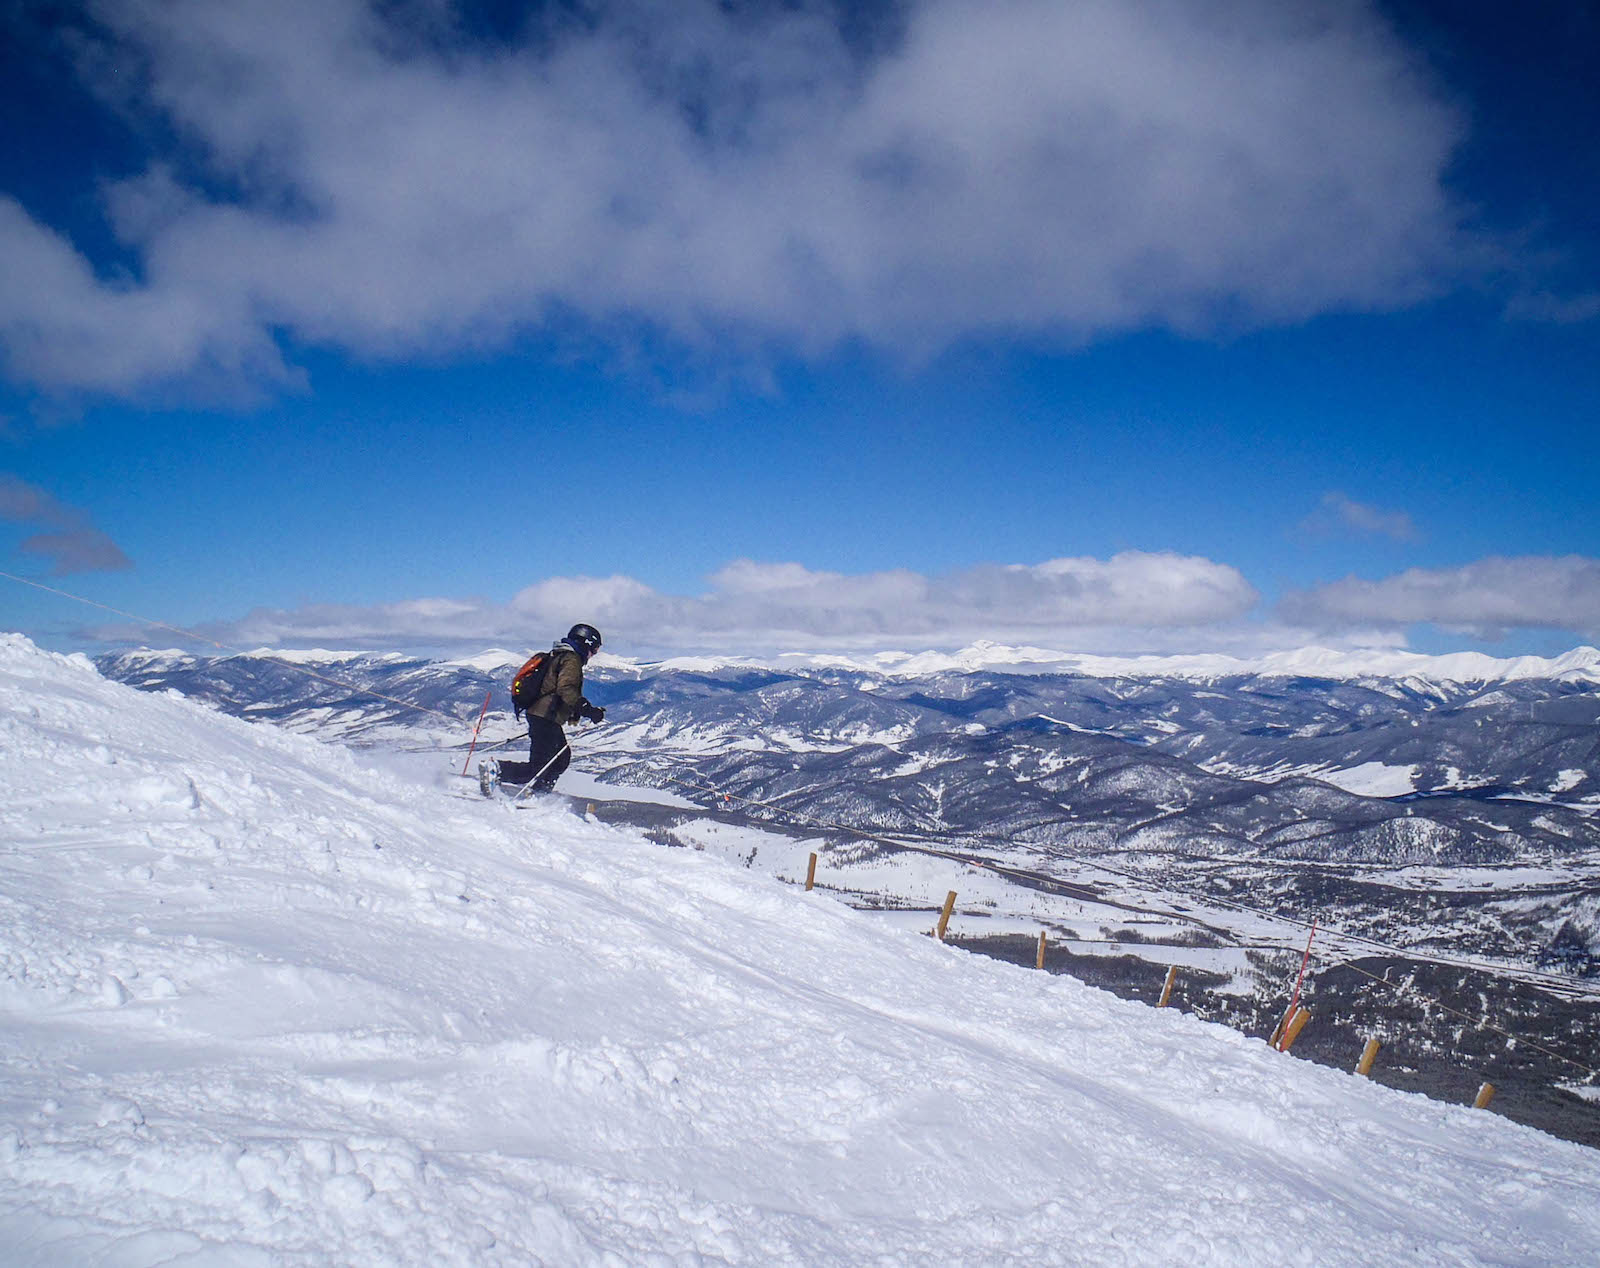 Bermain ski di Breckenridge, CO